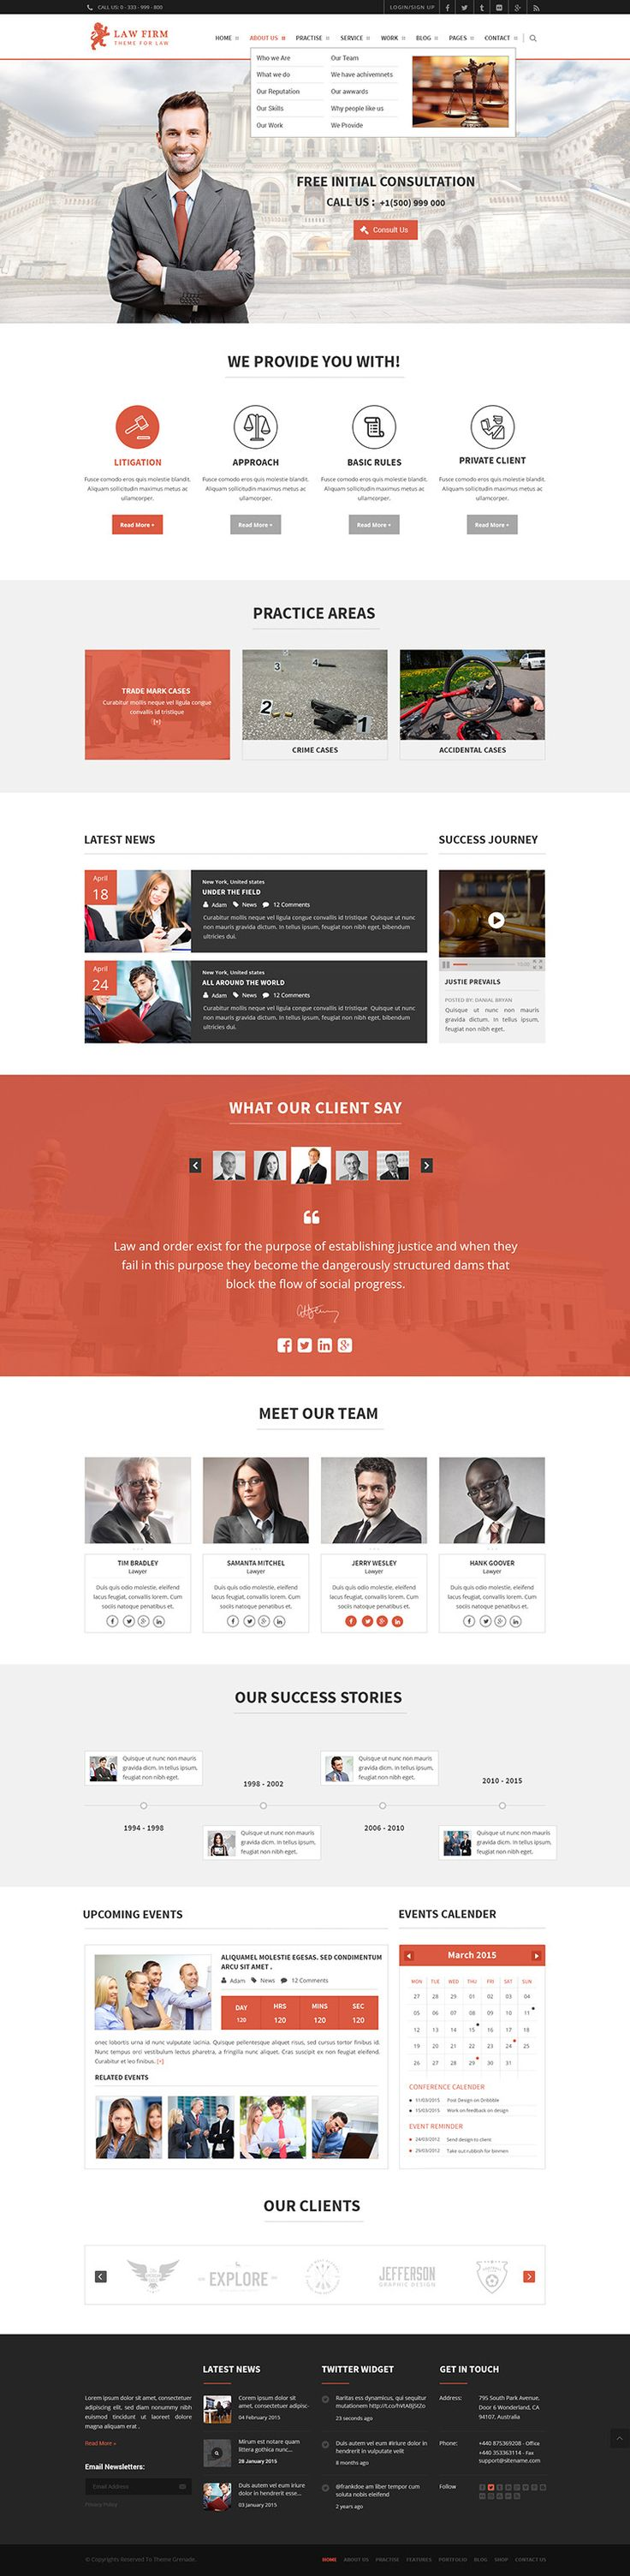 41 best website design flat long ui layout images on pinterest